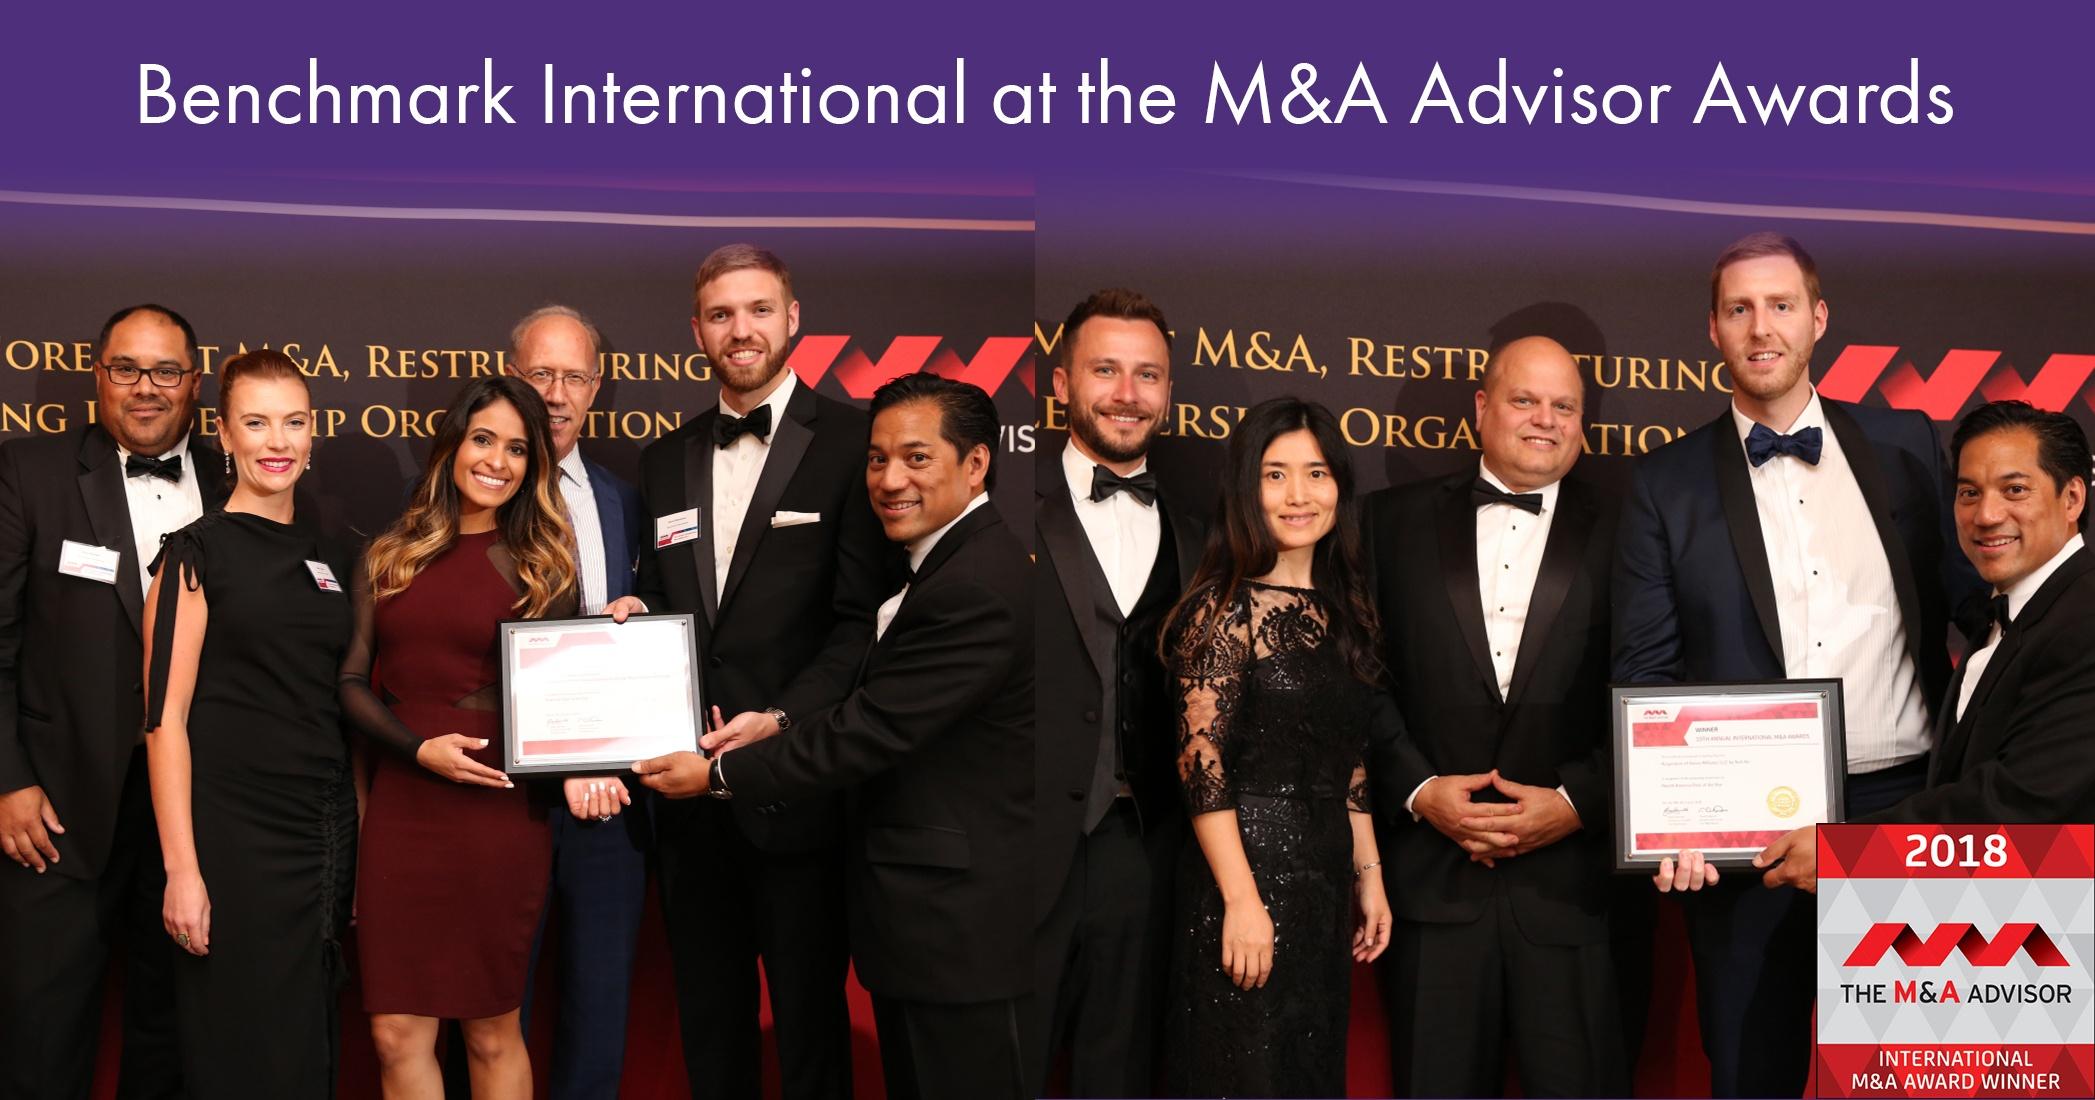 MA_Advisor_Awards_Photos_Benchmark